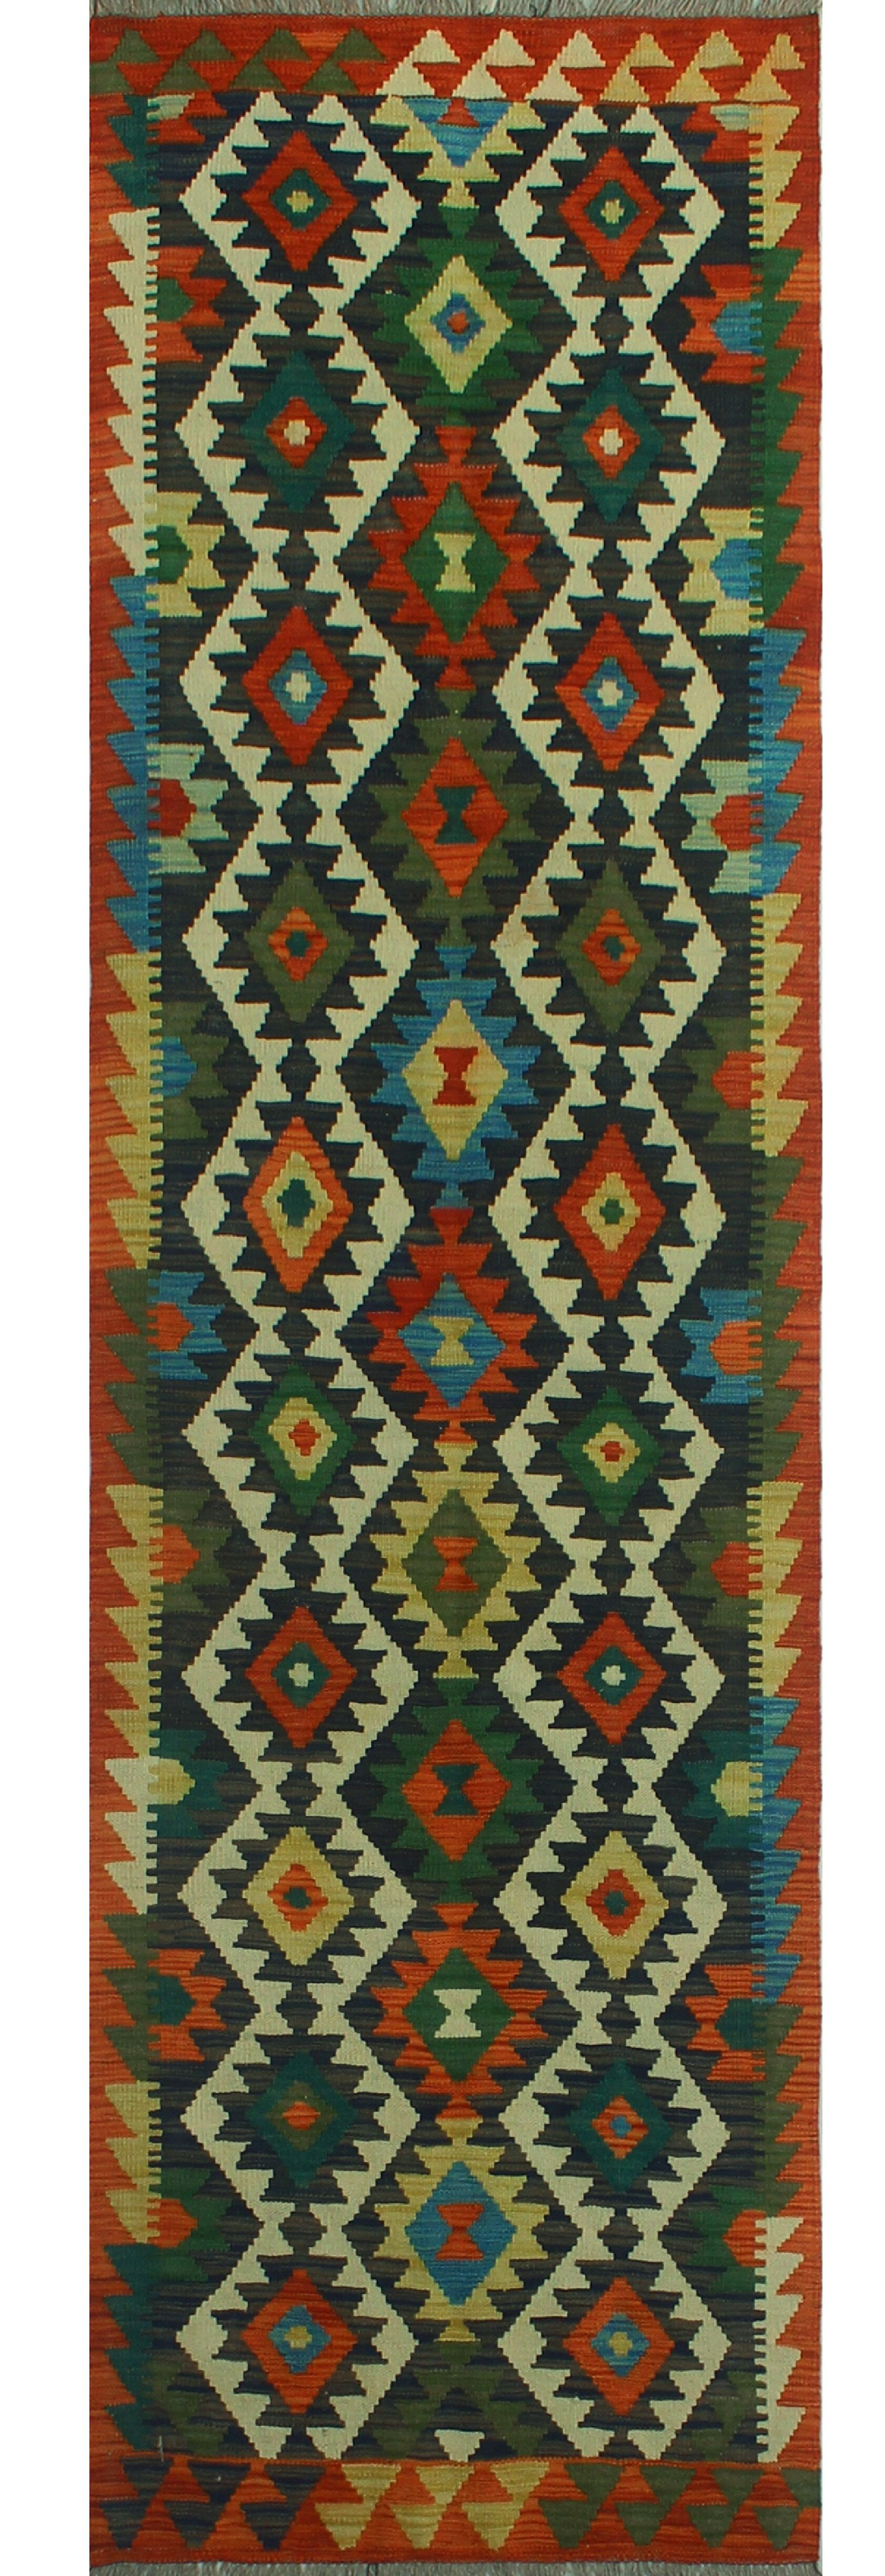 Foundry Select Runner Hults Southwestern Handmade Kilim Wool Red Green Area Rug Wayfair